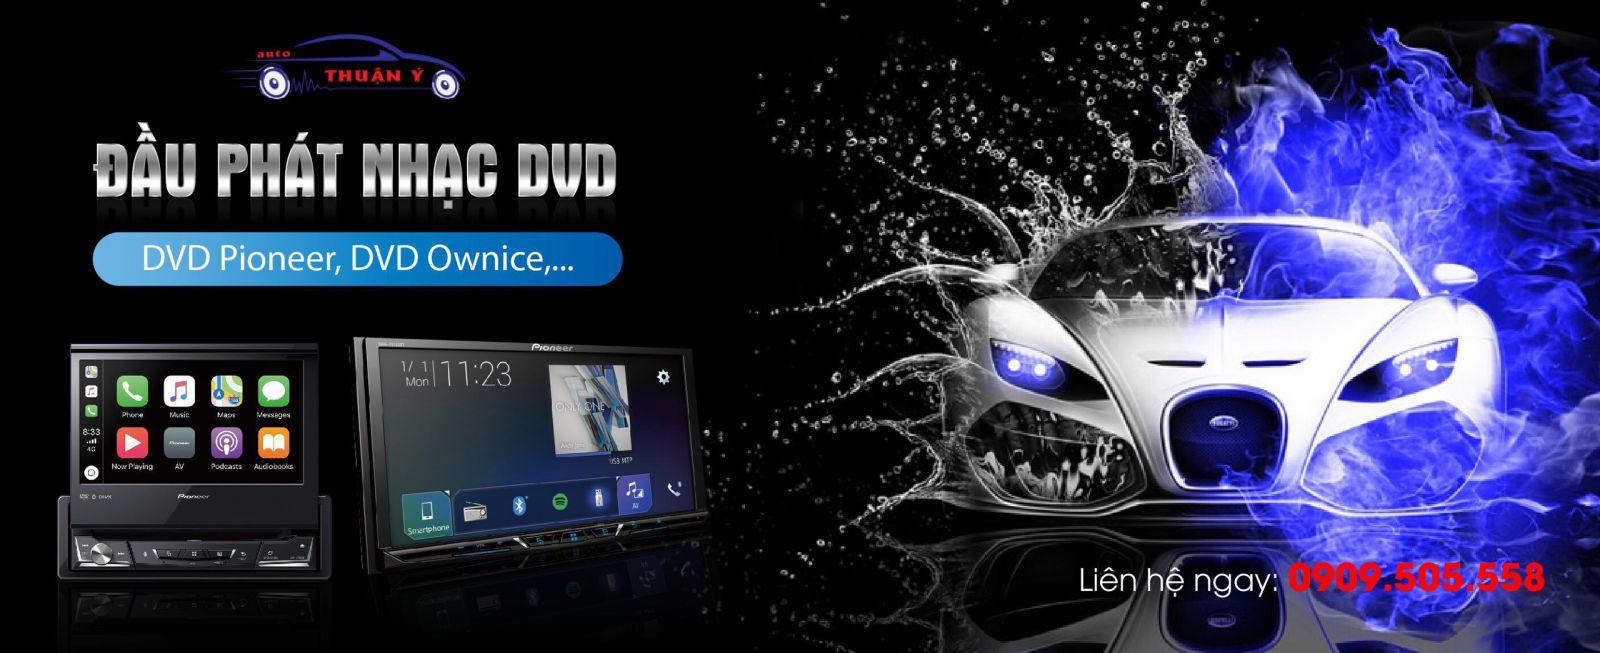 dau-phat-nhac-dvd